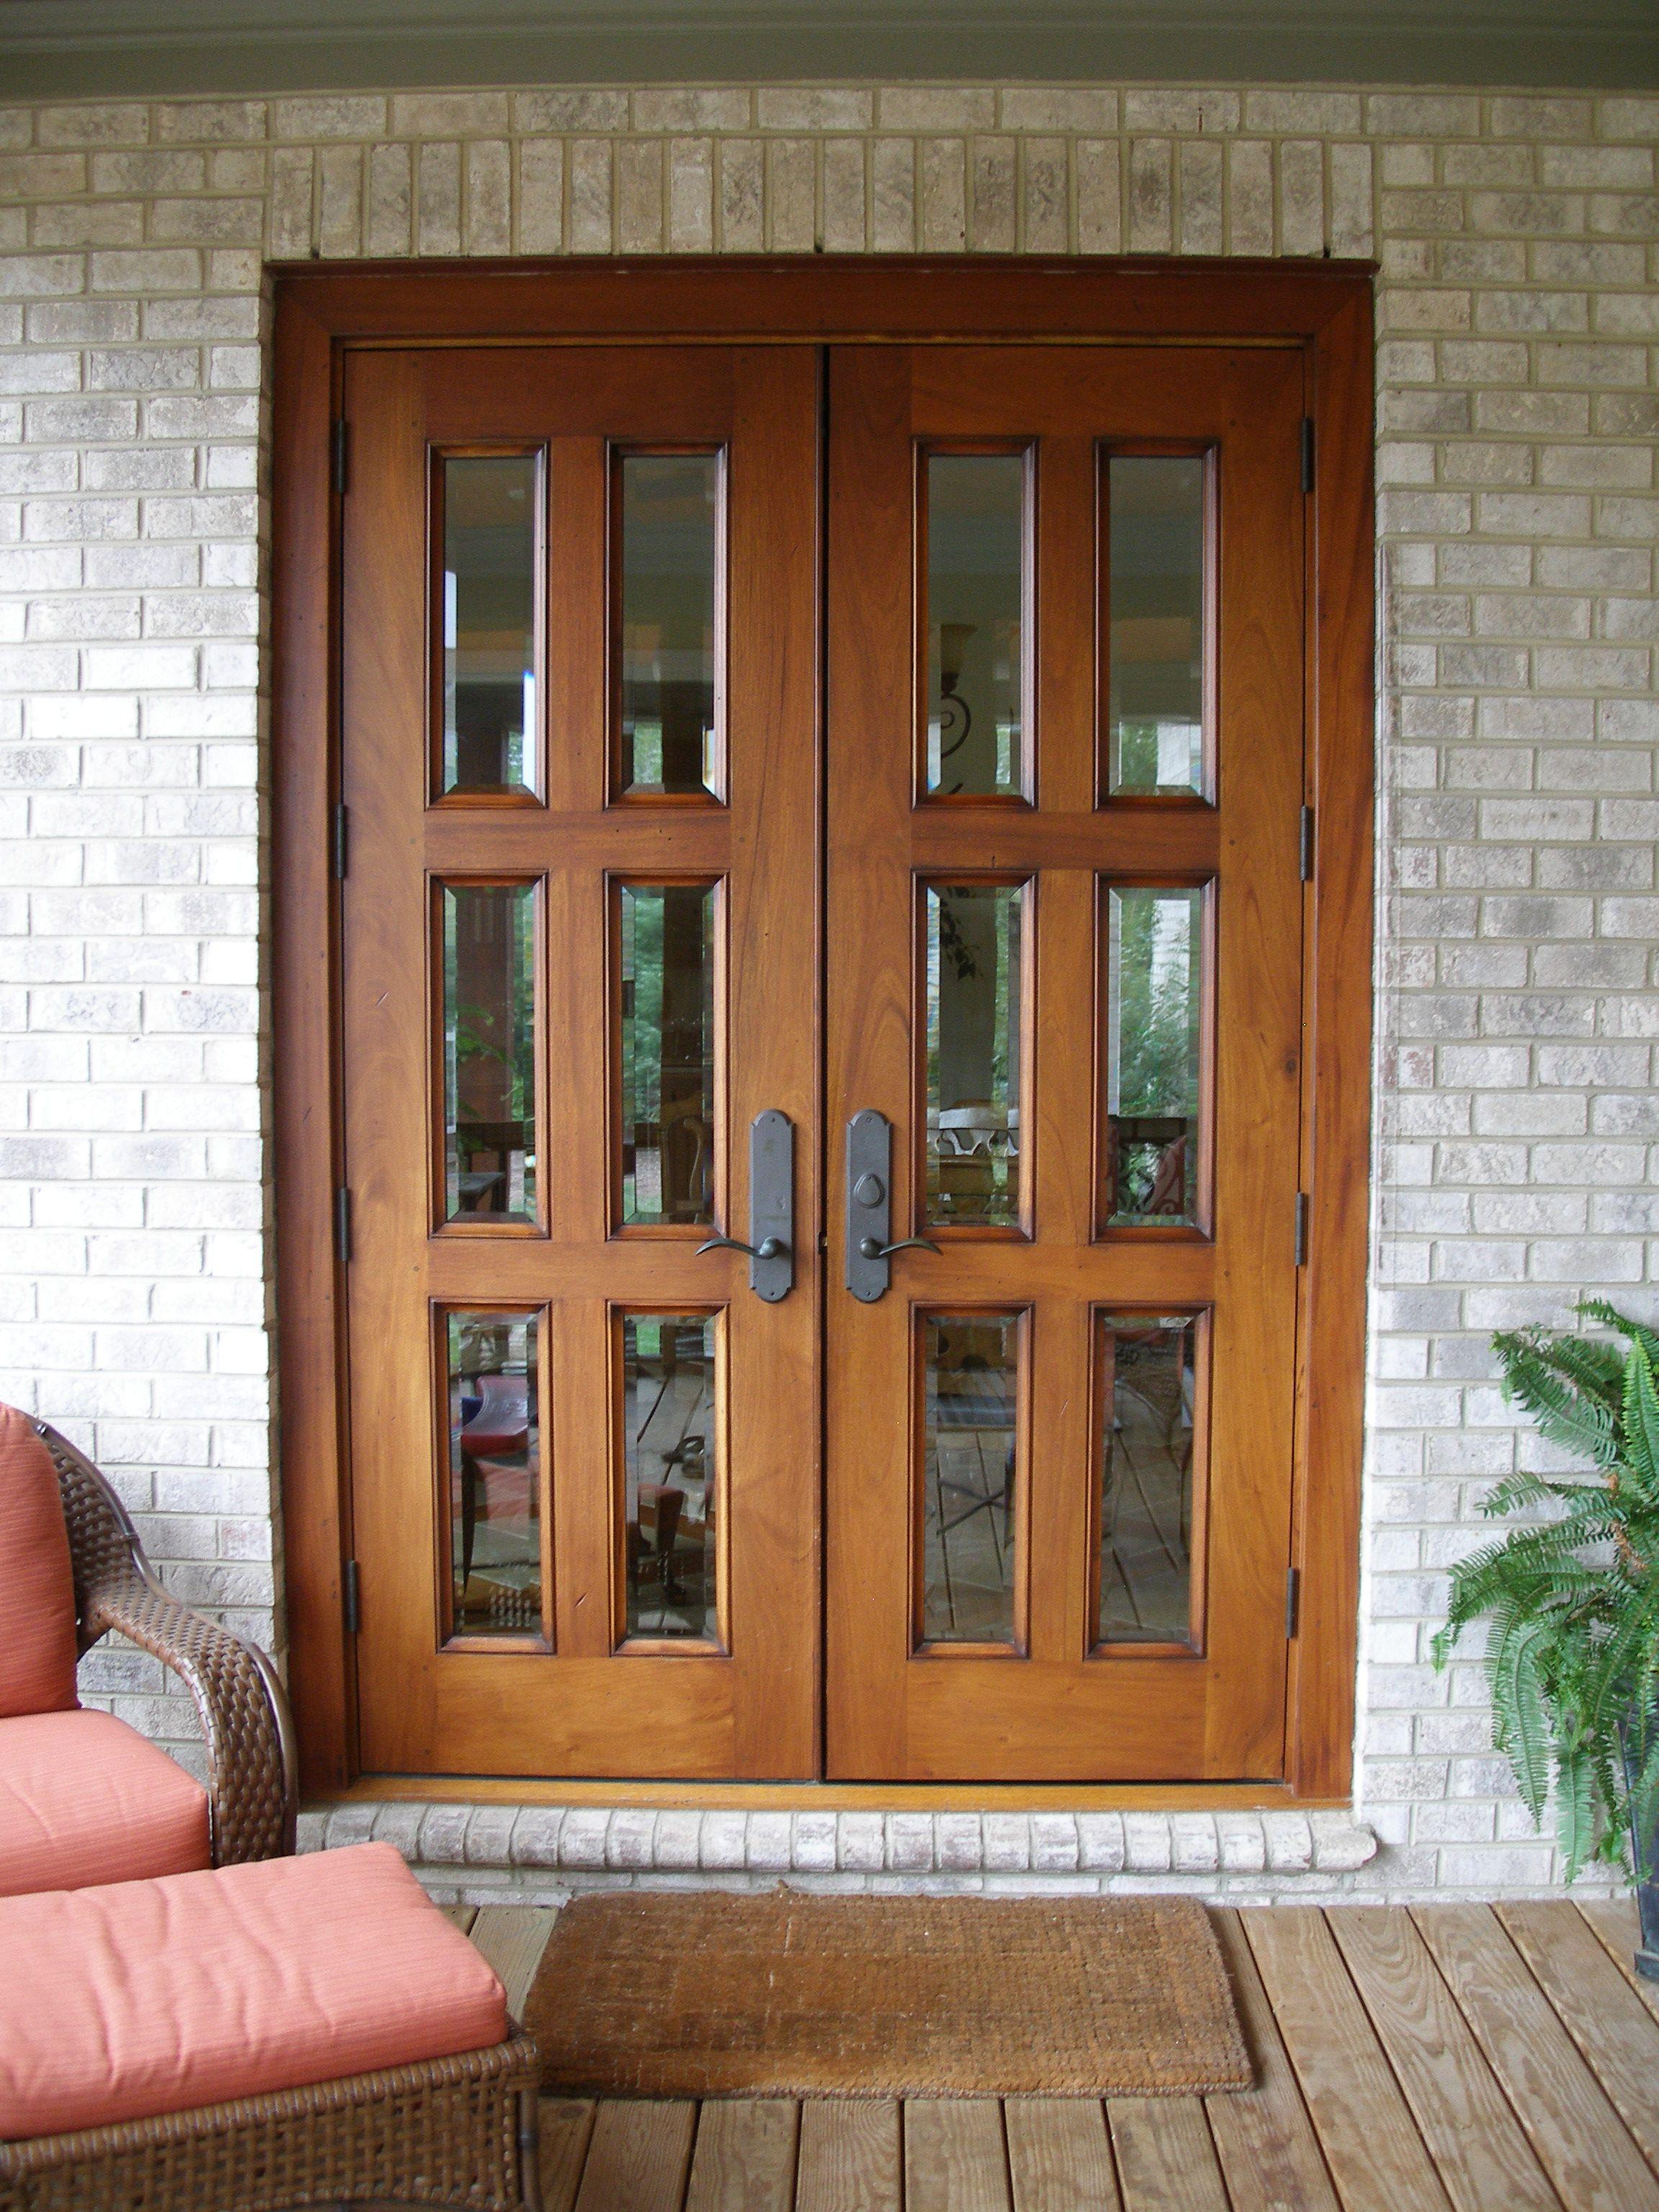 1-clean-wood-french-doors-exterior-lowes-vinyl-vs-wood ...